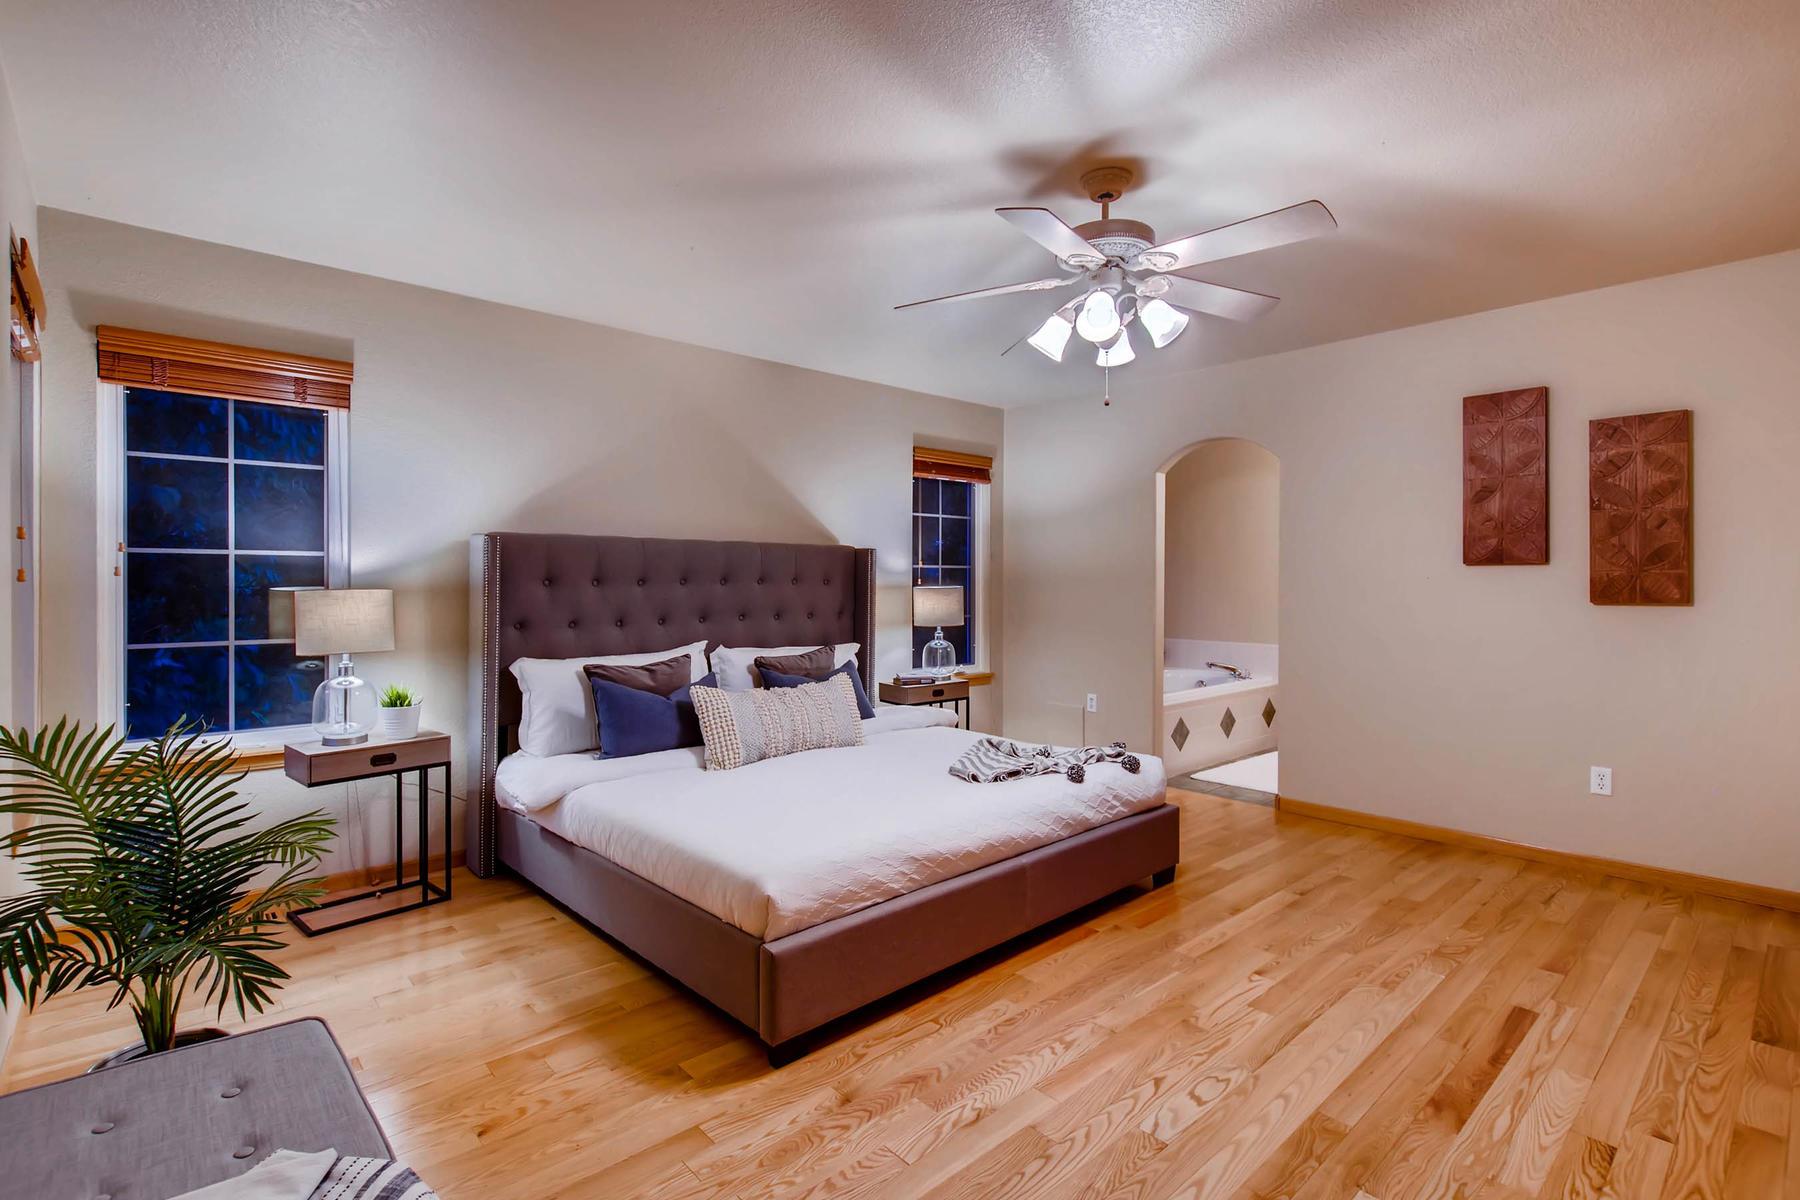 1694 Seven Lakes Dr Loveland-MLS_Size-020-3-2nd Floor Master Bedroom-1800x1200-72dpi.jpg